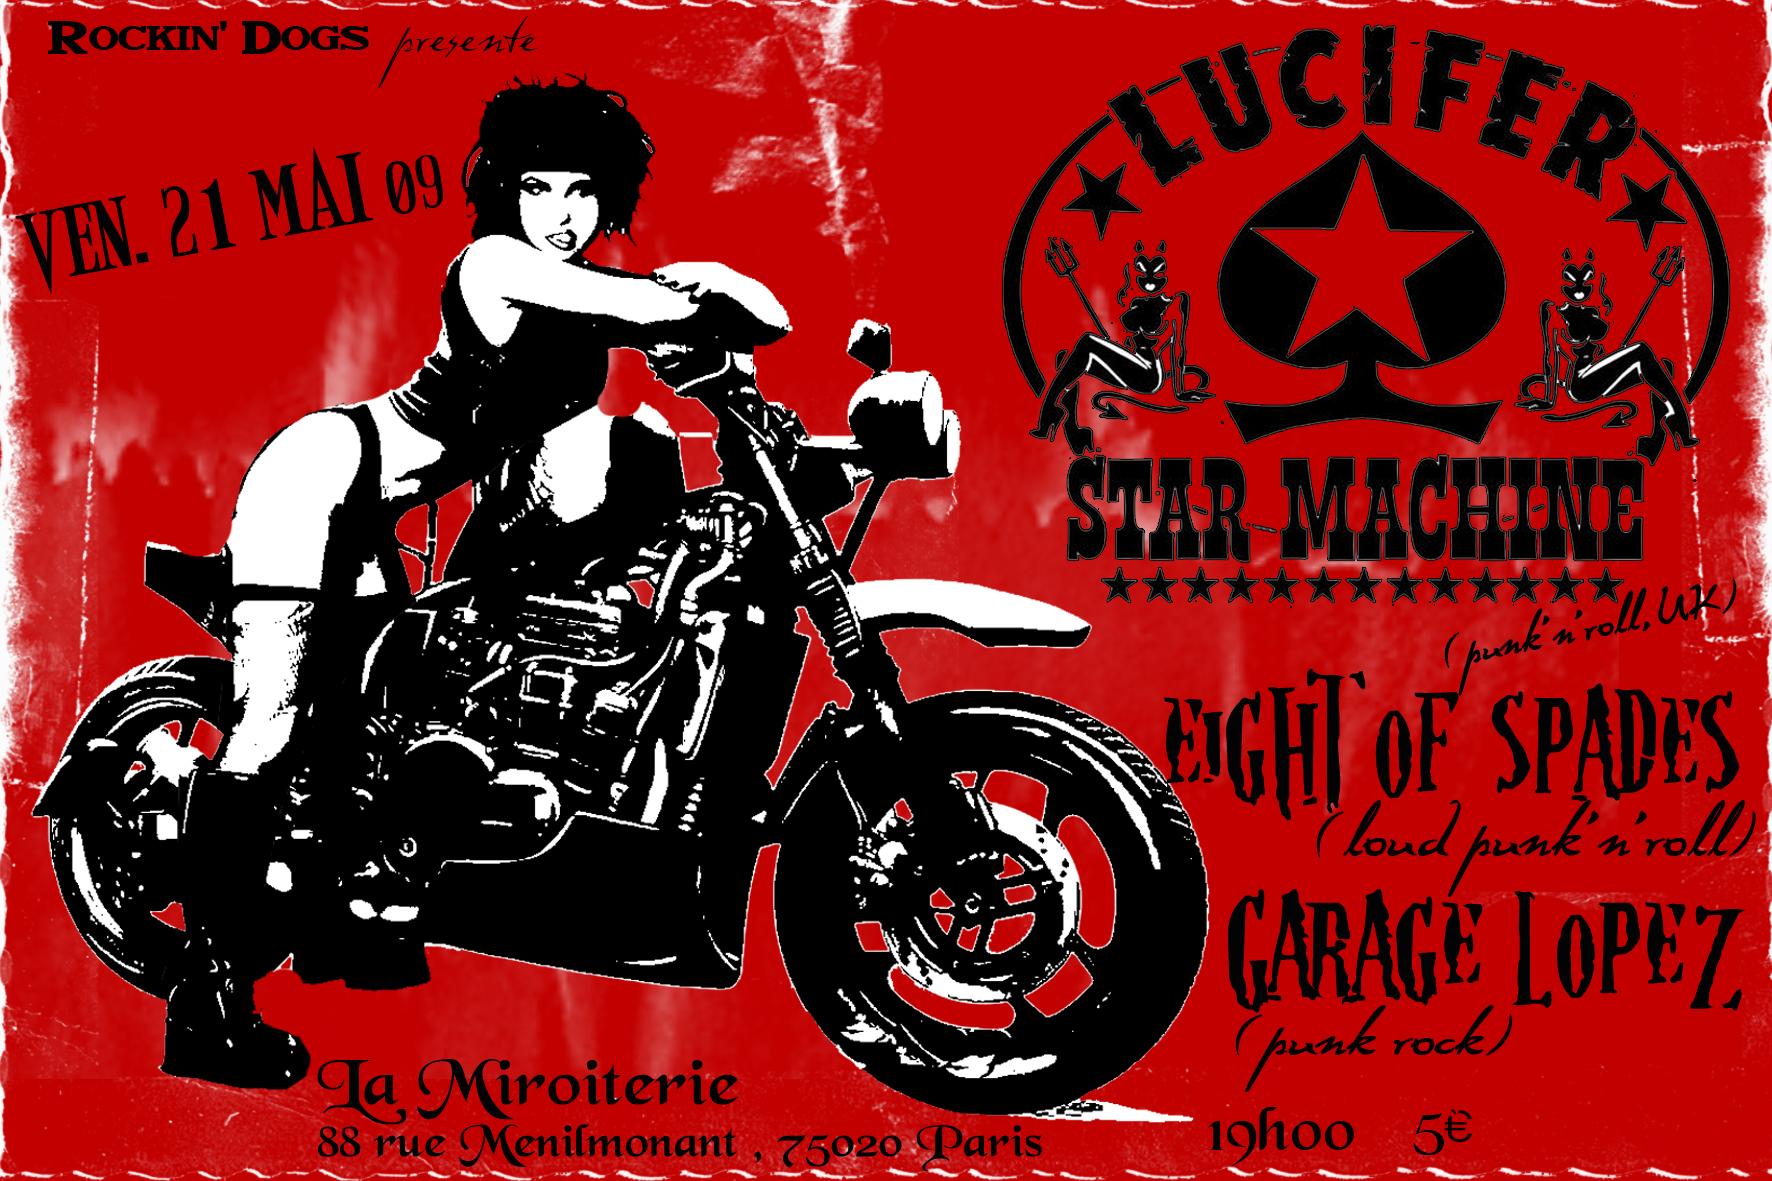 "21 mai 2009 Lucifer Star Machine, Eight Of Spades, Garage Lopez à Paris ""La Miroiterie"""